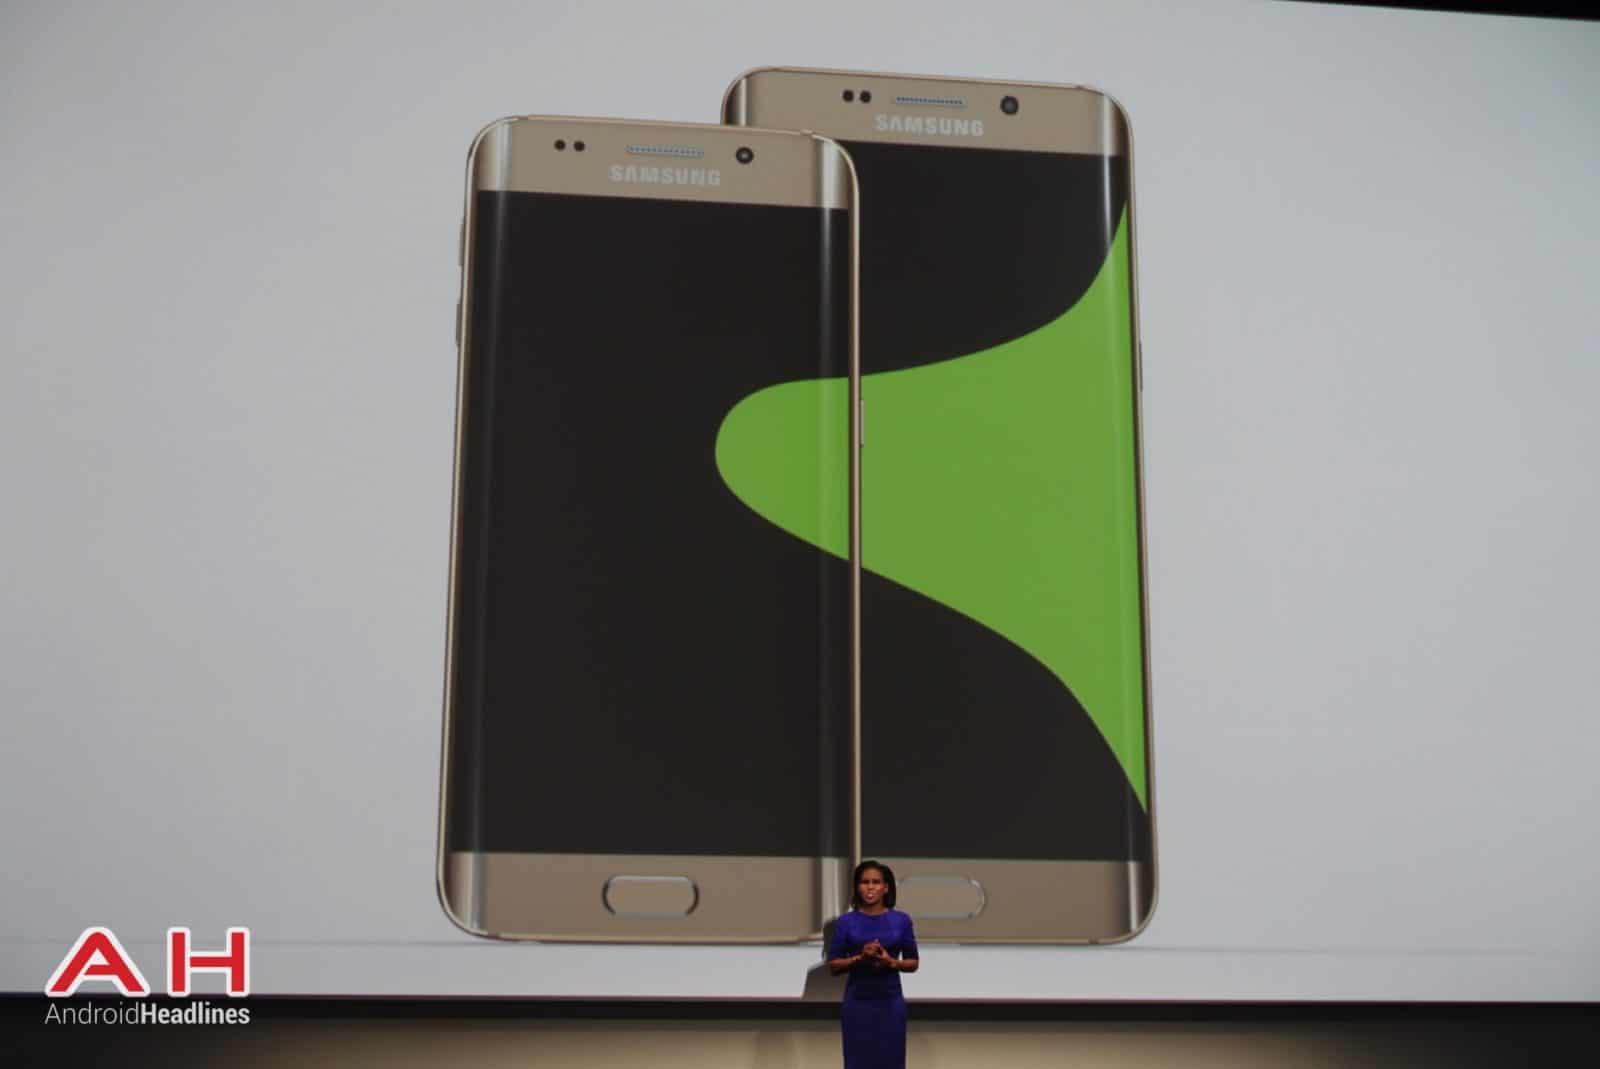 Samsung Unpacked 15 AH 23